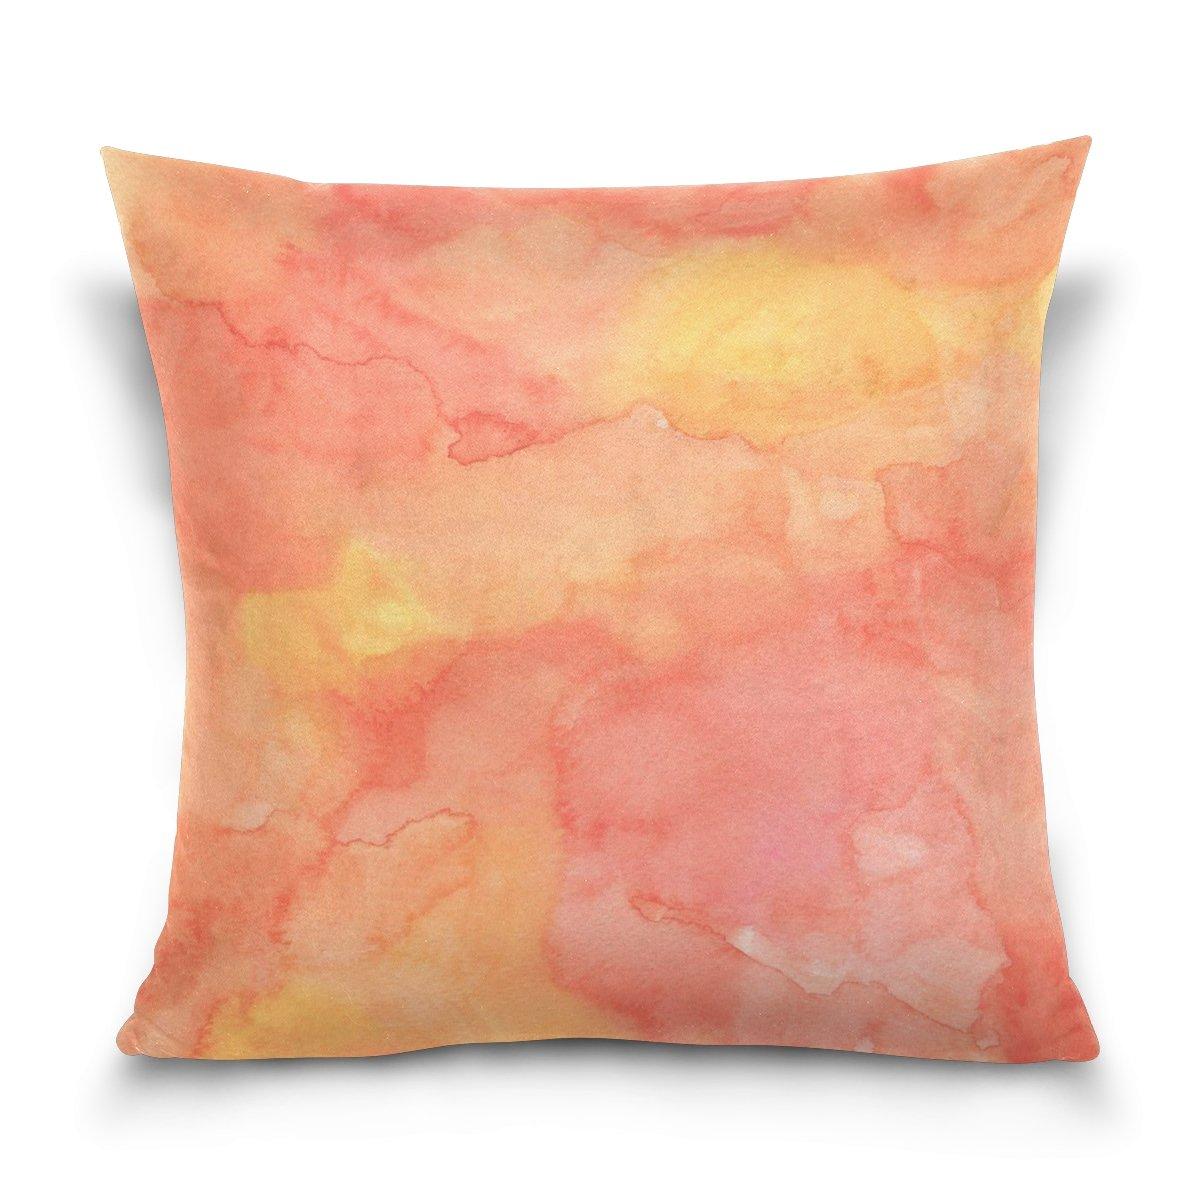 Amazon.com: LEEZONE Cotton Flock Decorative Throw Pillow ...